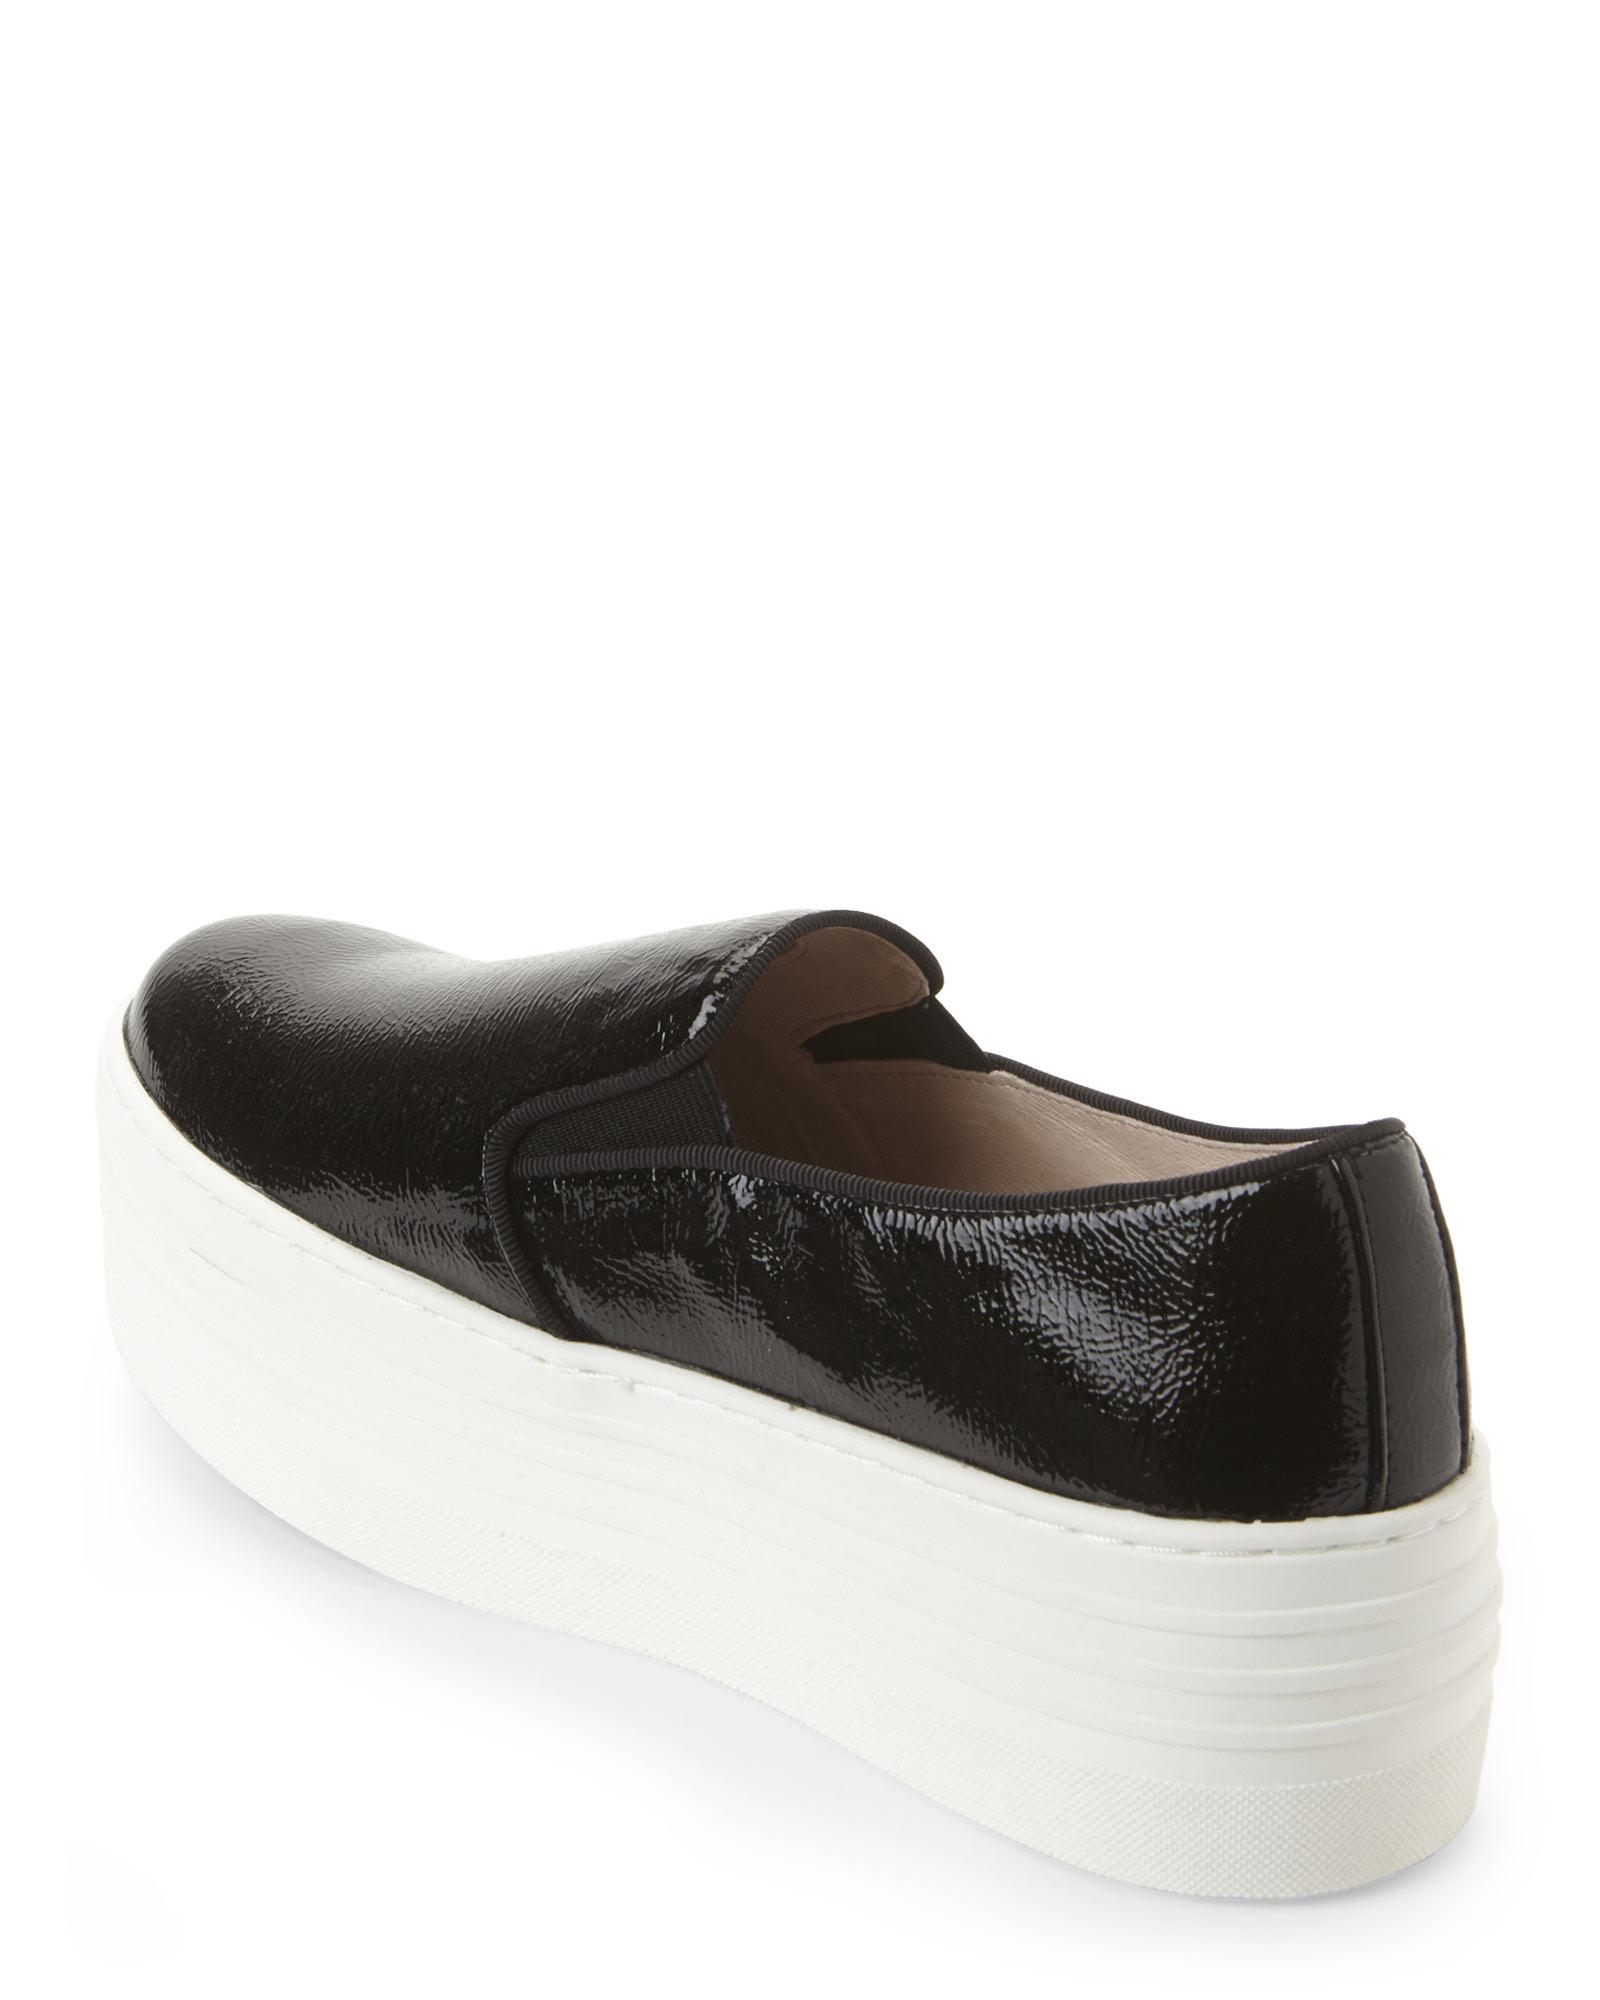 f2b85fdbf6d Steve Madden Black Patent Bellie Platform Sneakers